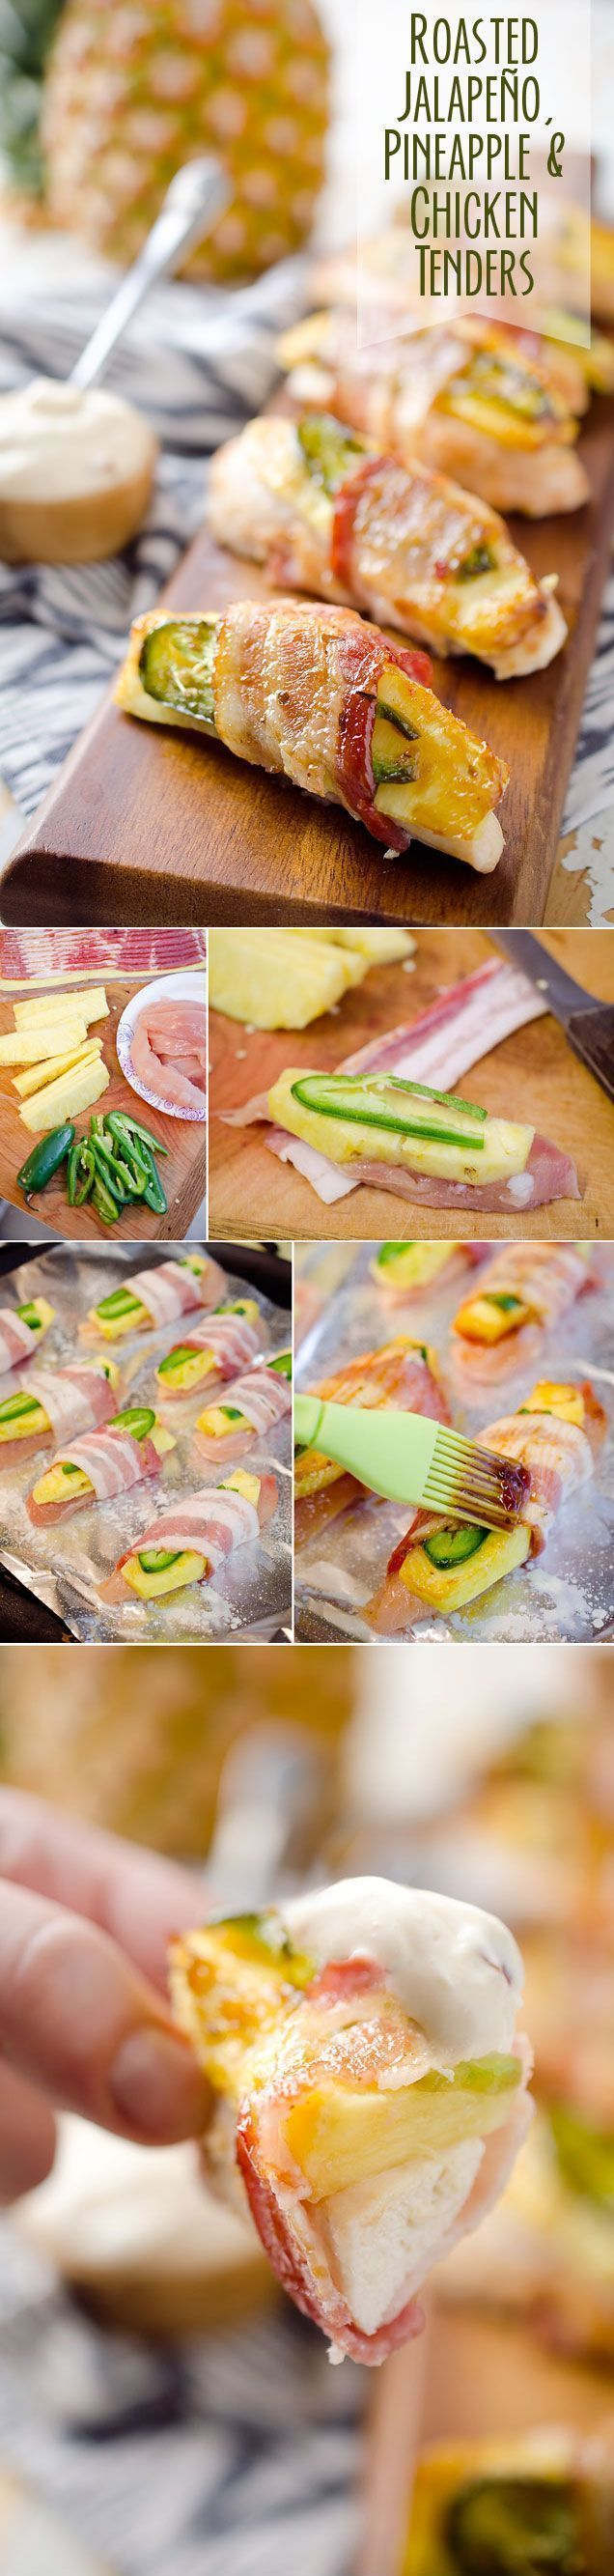 Roasted Jalapeño, Pineapple & Chicken Tenders Krafted